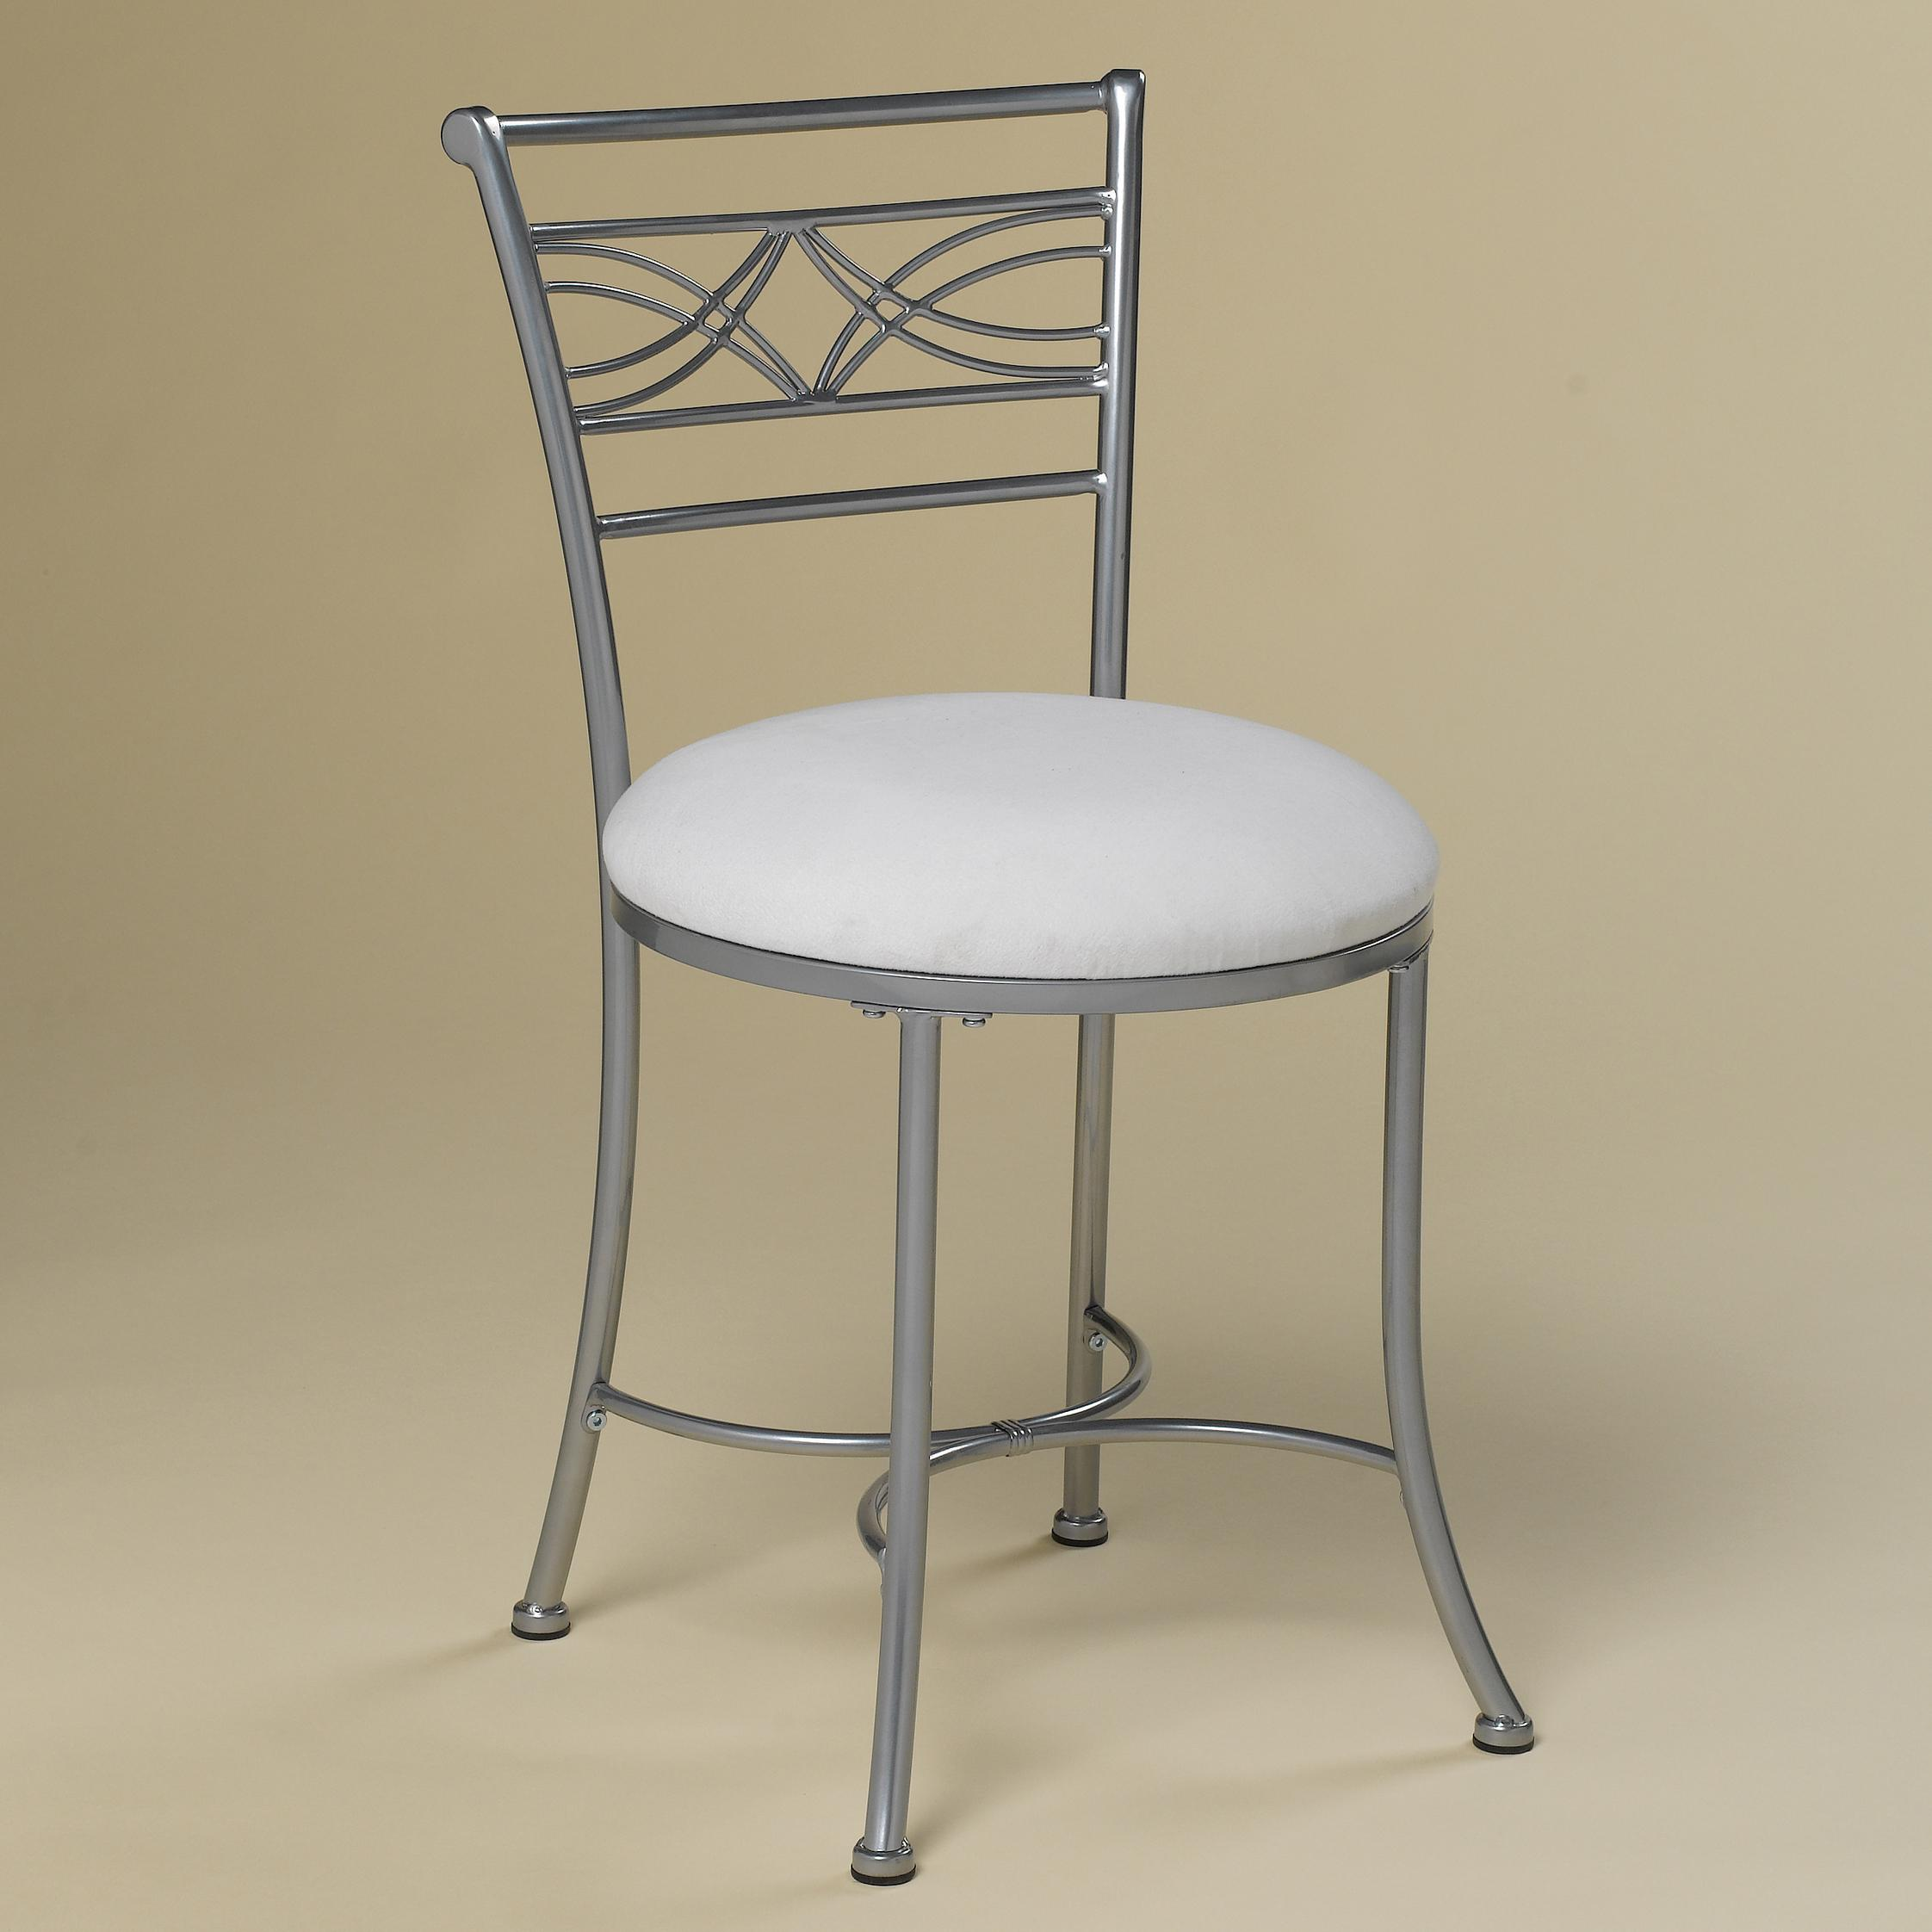 Vanity Stools Dutton Vanity Stool by Hillsdale at Mueller Furniture